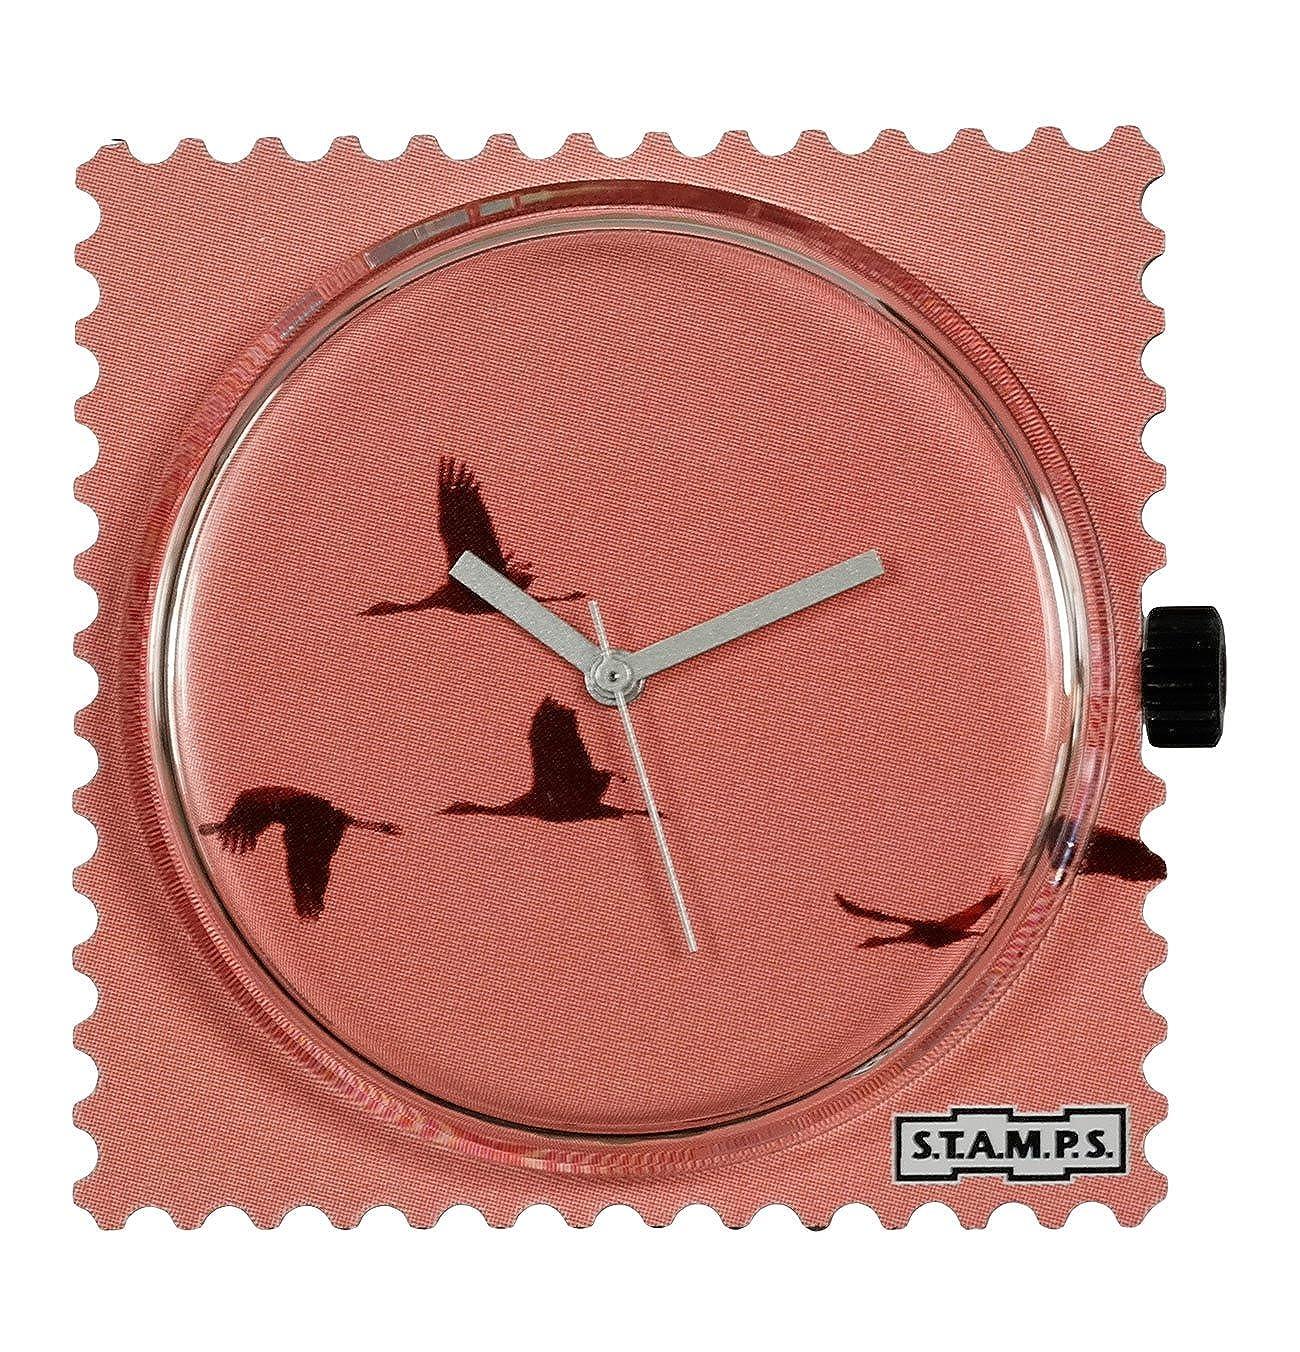 S.T.A.M.P.S. Stamps Esfera Reloj Big Journey 103004: Amazon.es ...